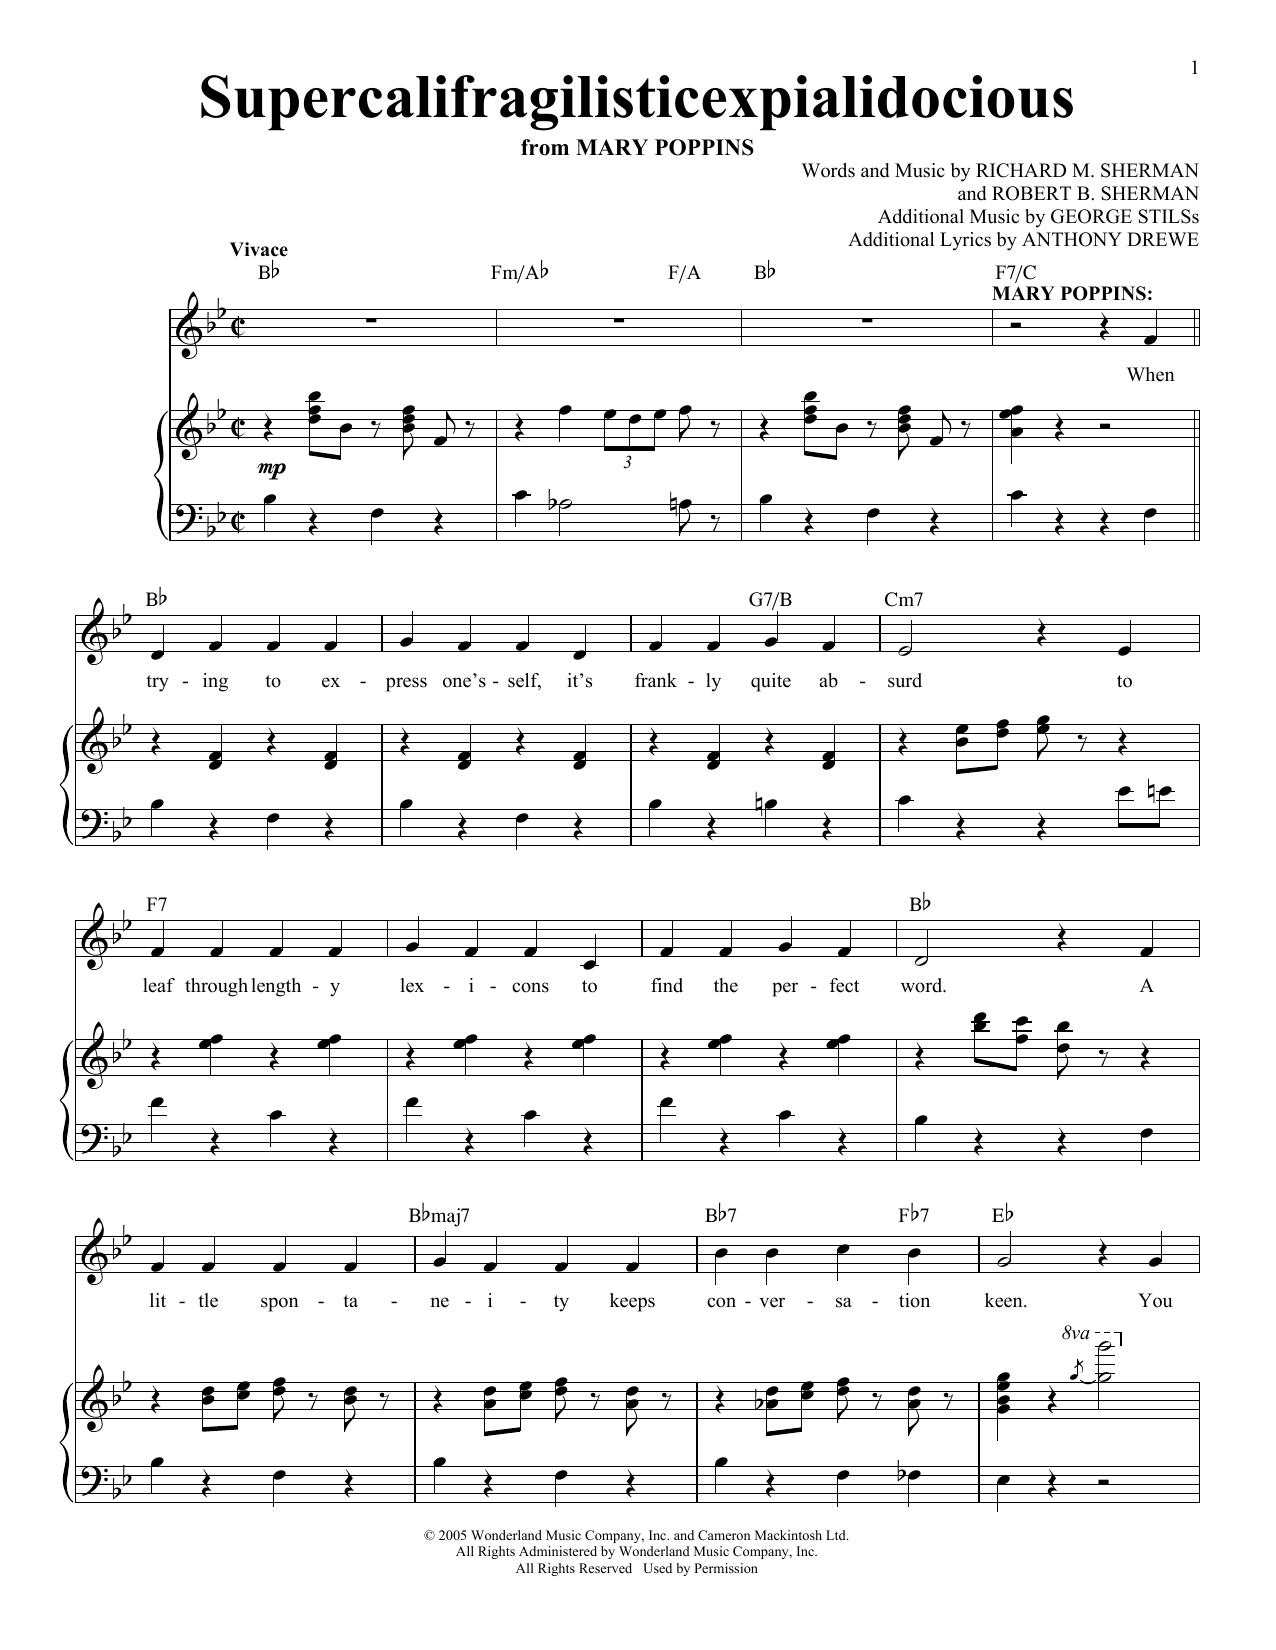 Supercalifragilisticexpialidocious (Piano & Vocal)